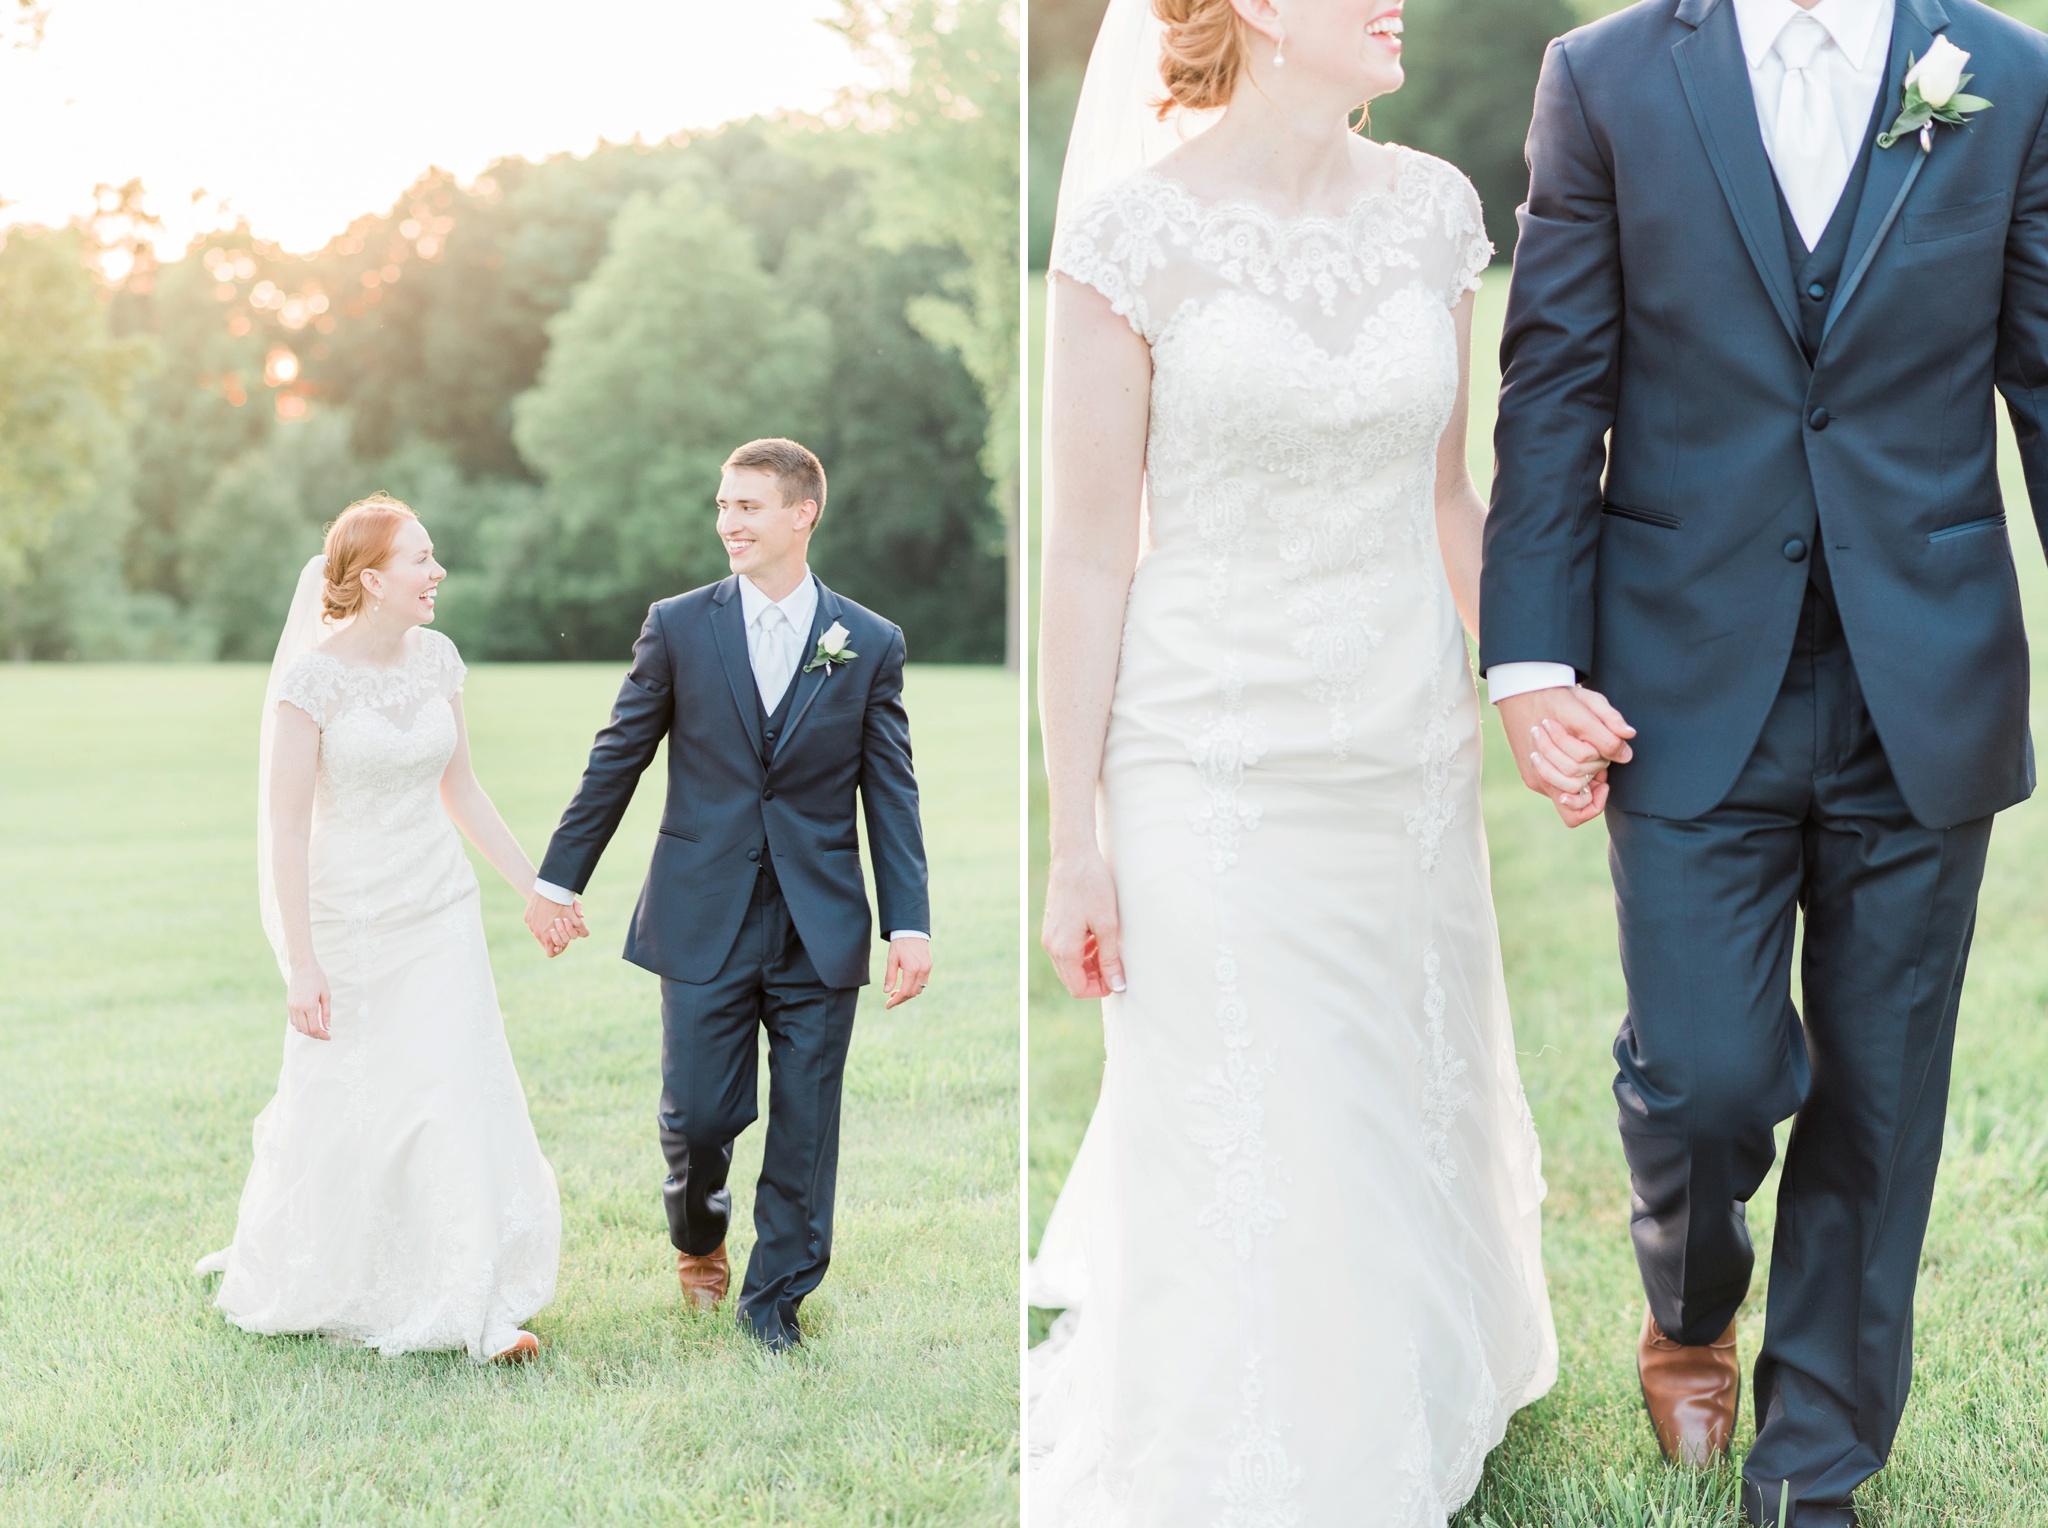 sunbury-ohio-wedding-hannah-johnathan_0154.jpg